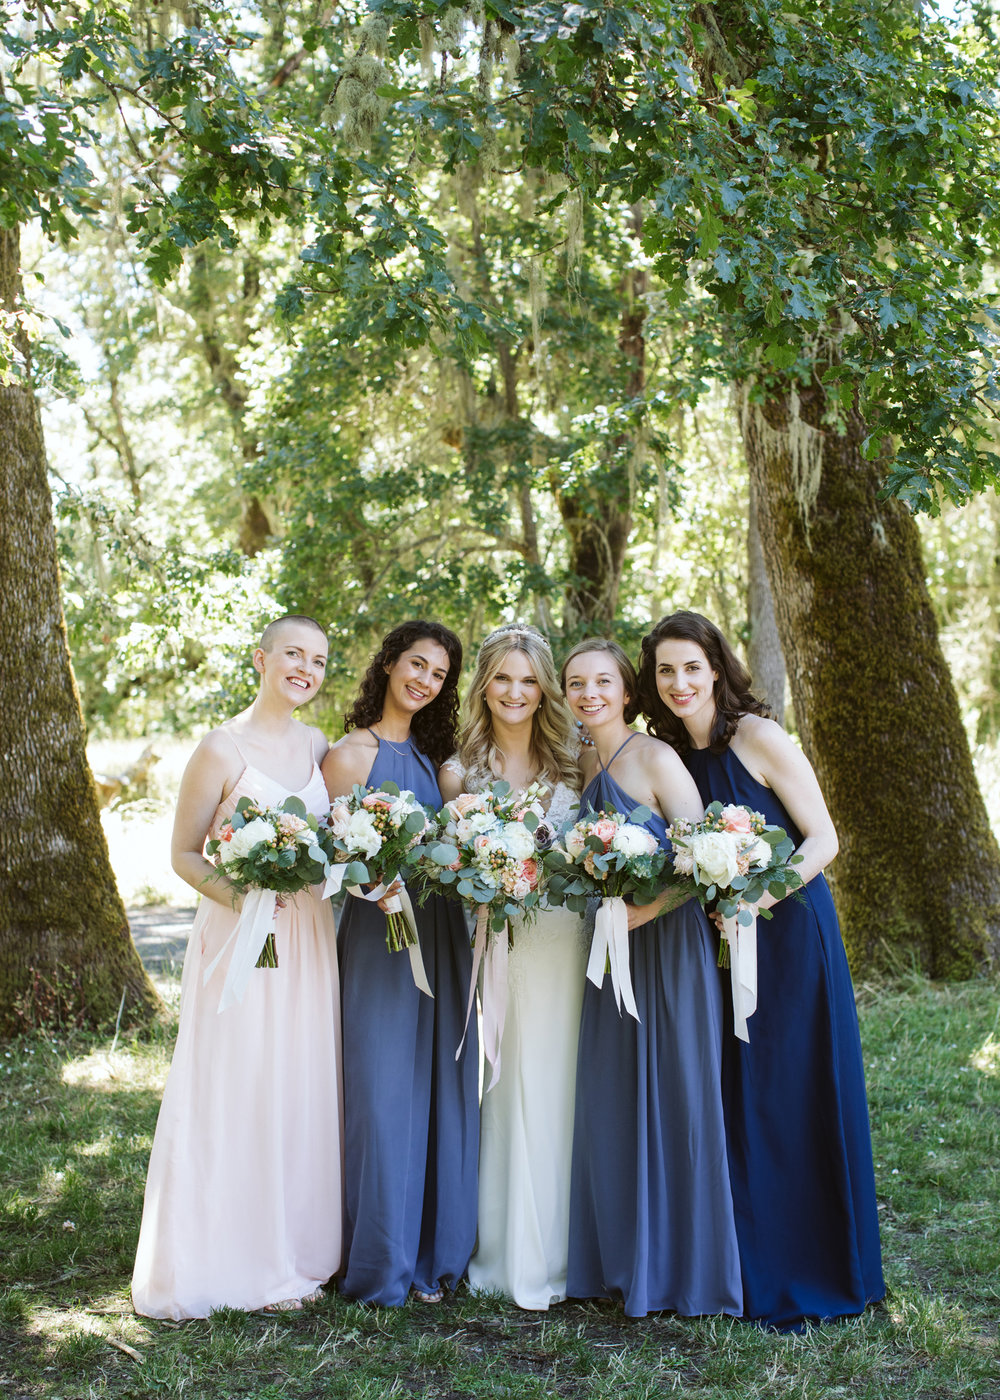 028-daronjackson-rachel-michael-wedding-mtpisgah.jpg